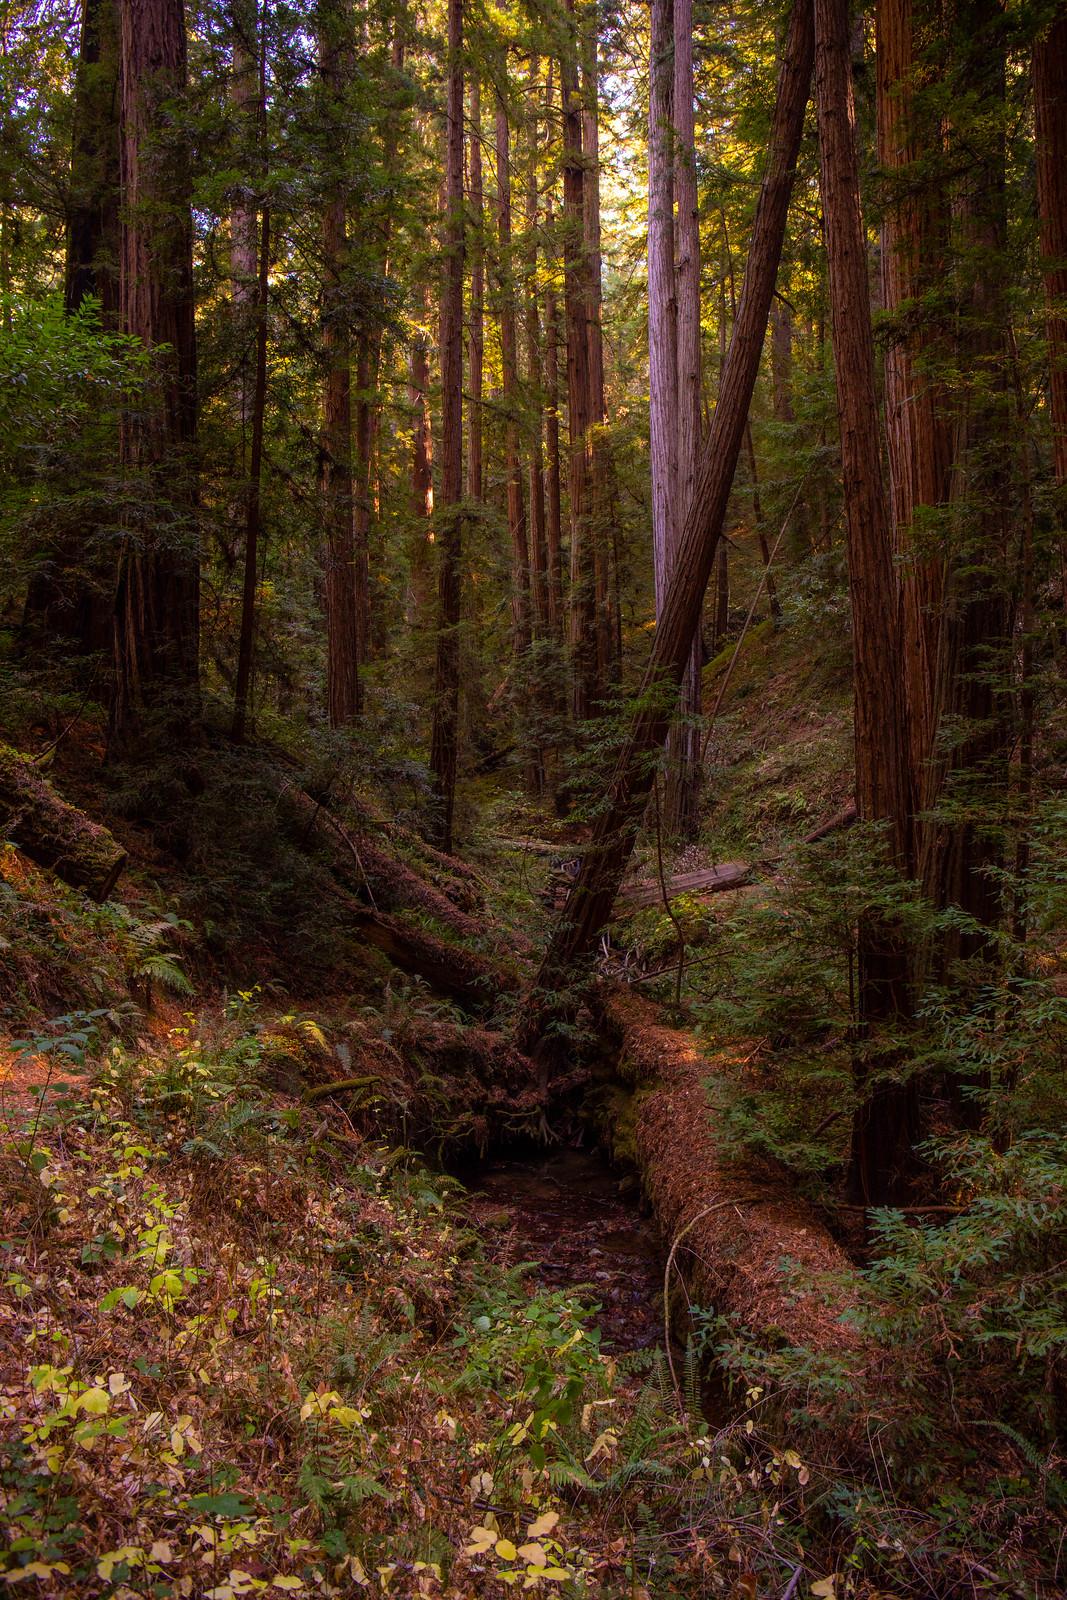 11.09. Portola Redwoods State Park